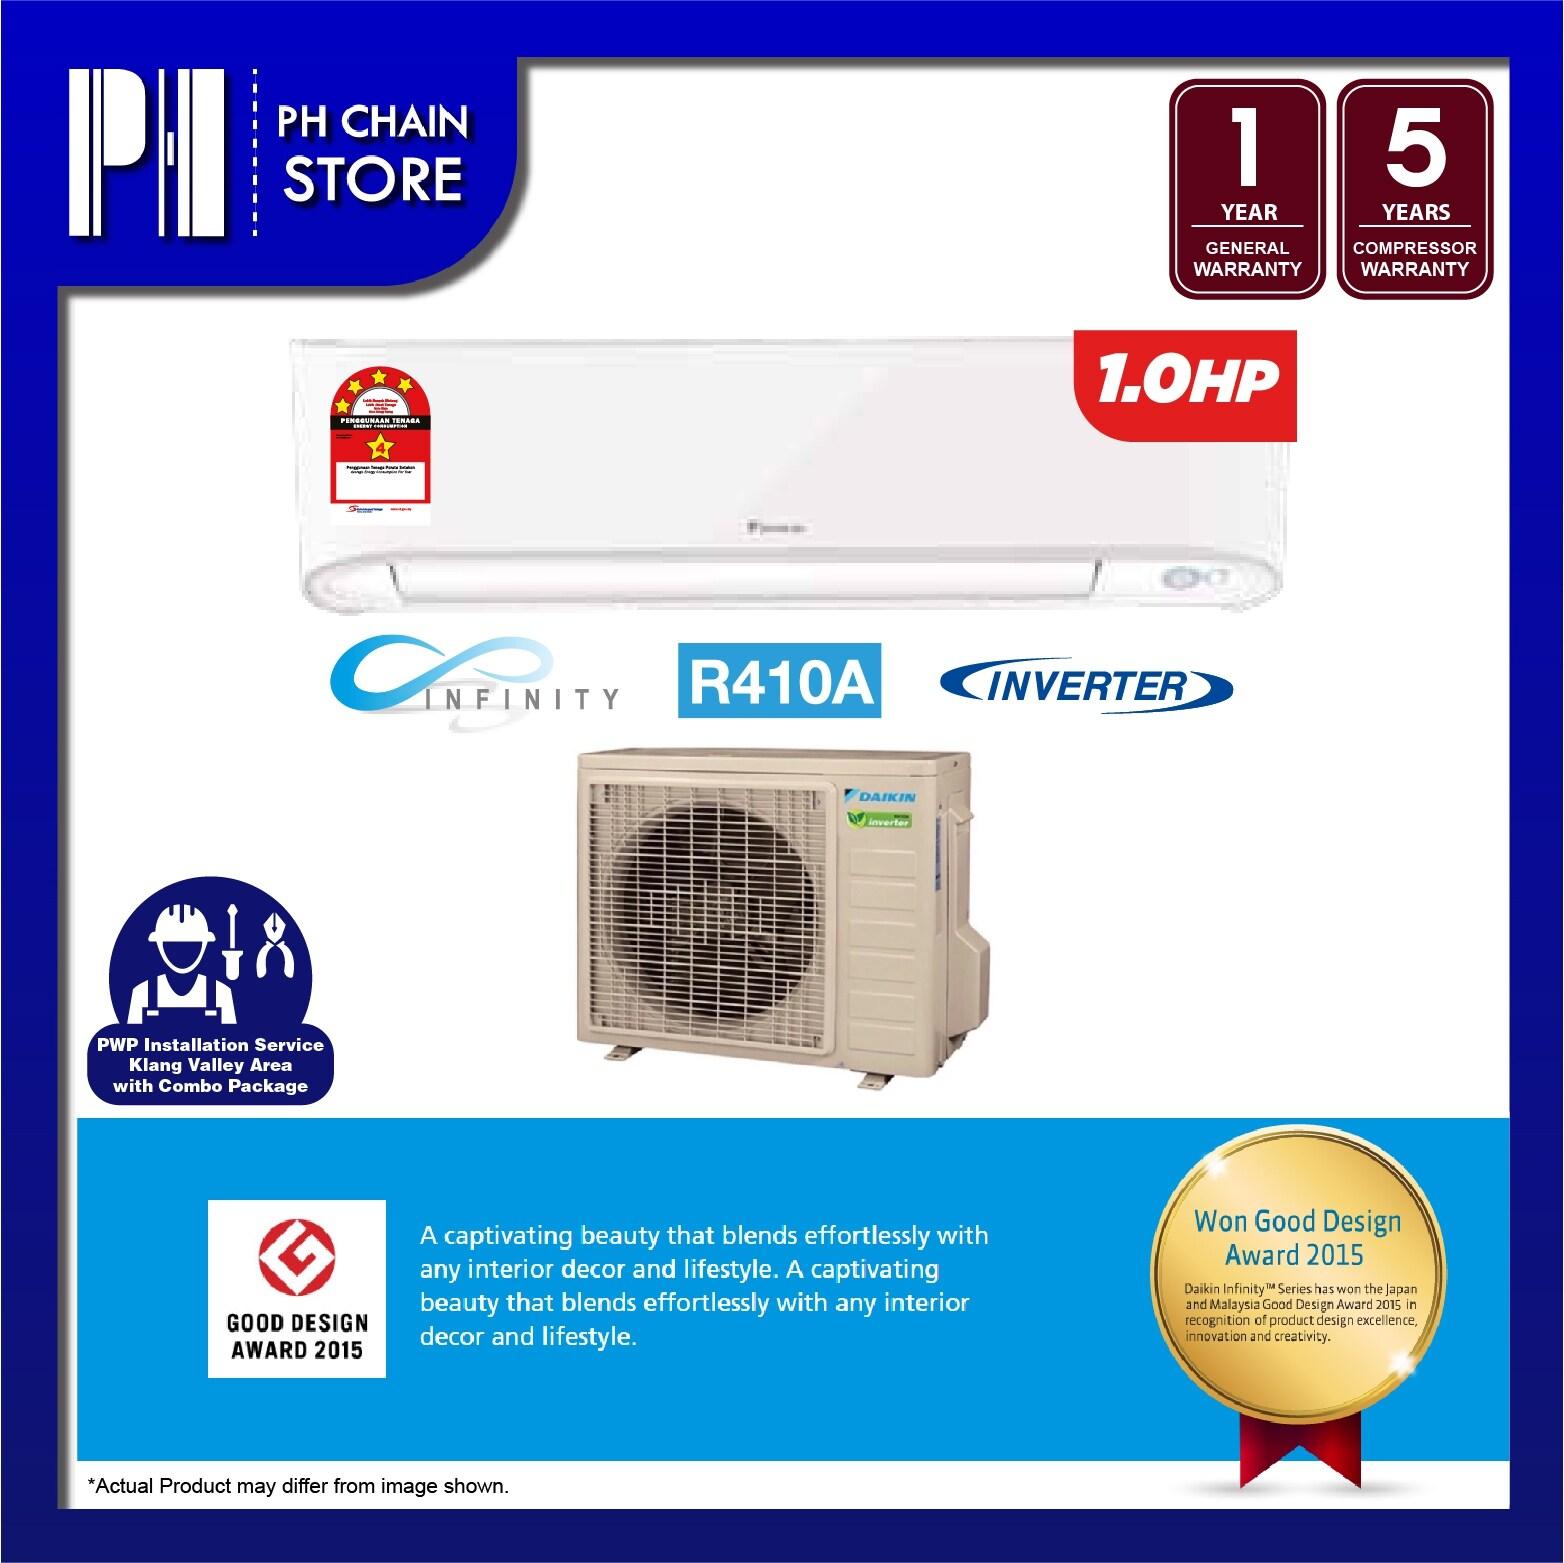 DAIKIN FTK10TV1W/RK10FV1 1.0HP (9500BTU) INFINITY SERIES R410A INVERTER WALL MOUNTED AIR CONDITIONER